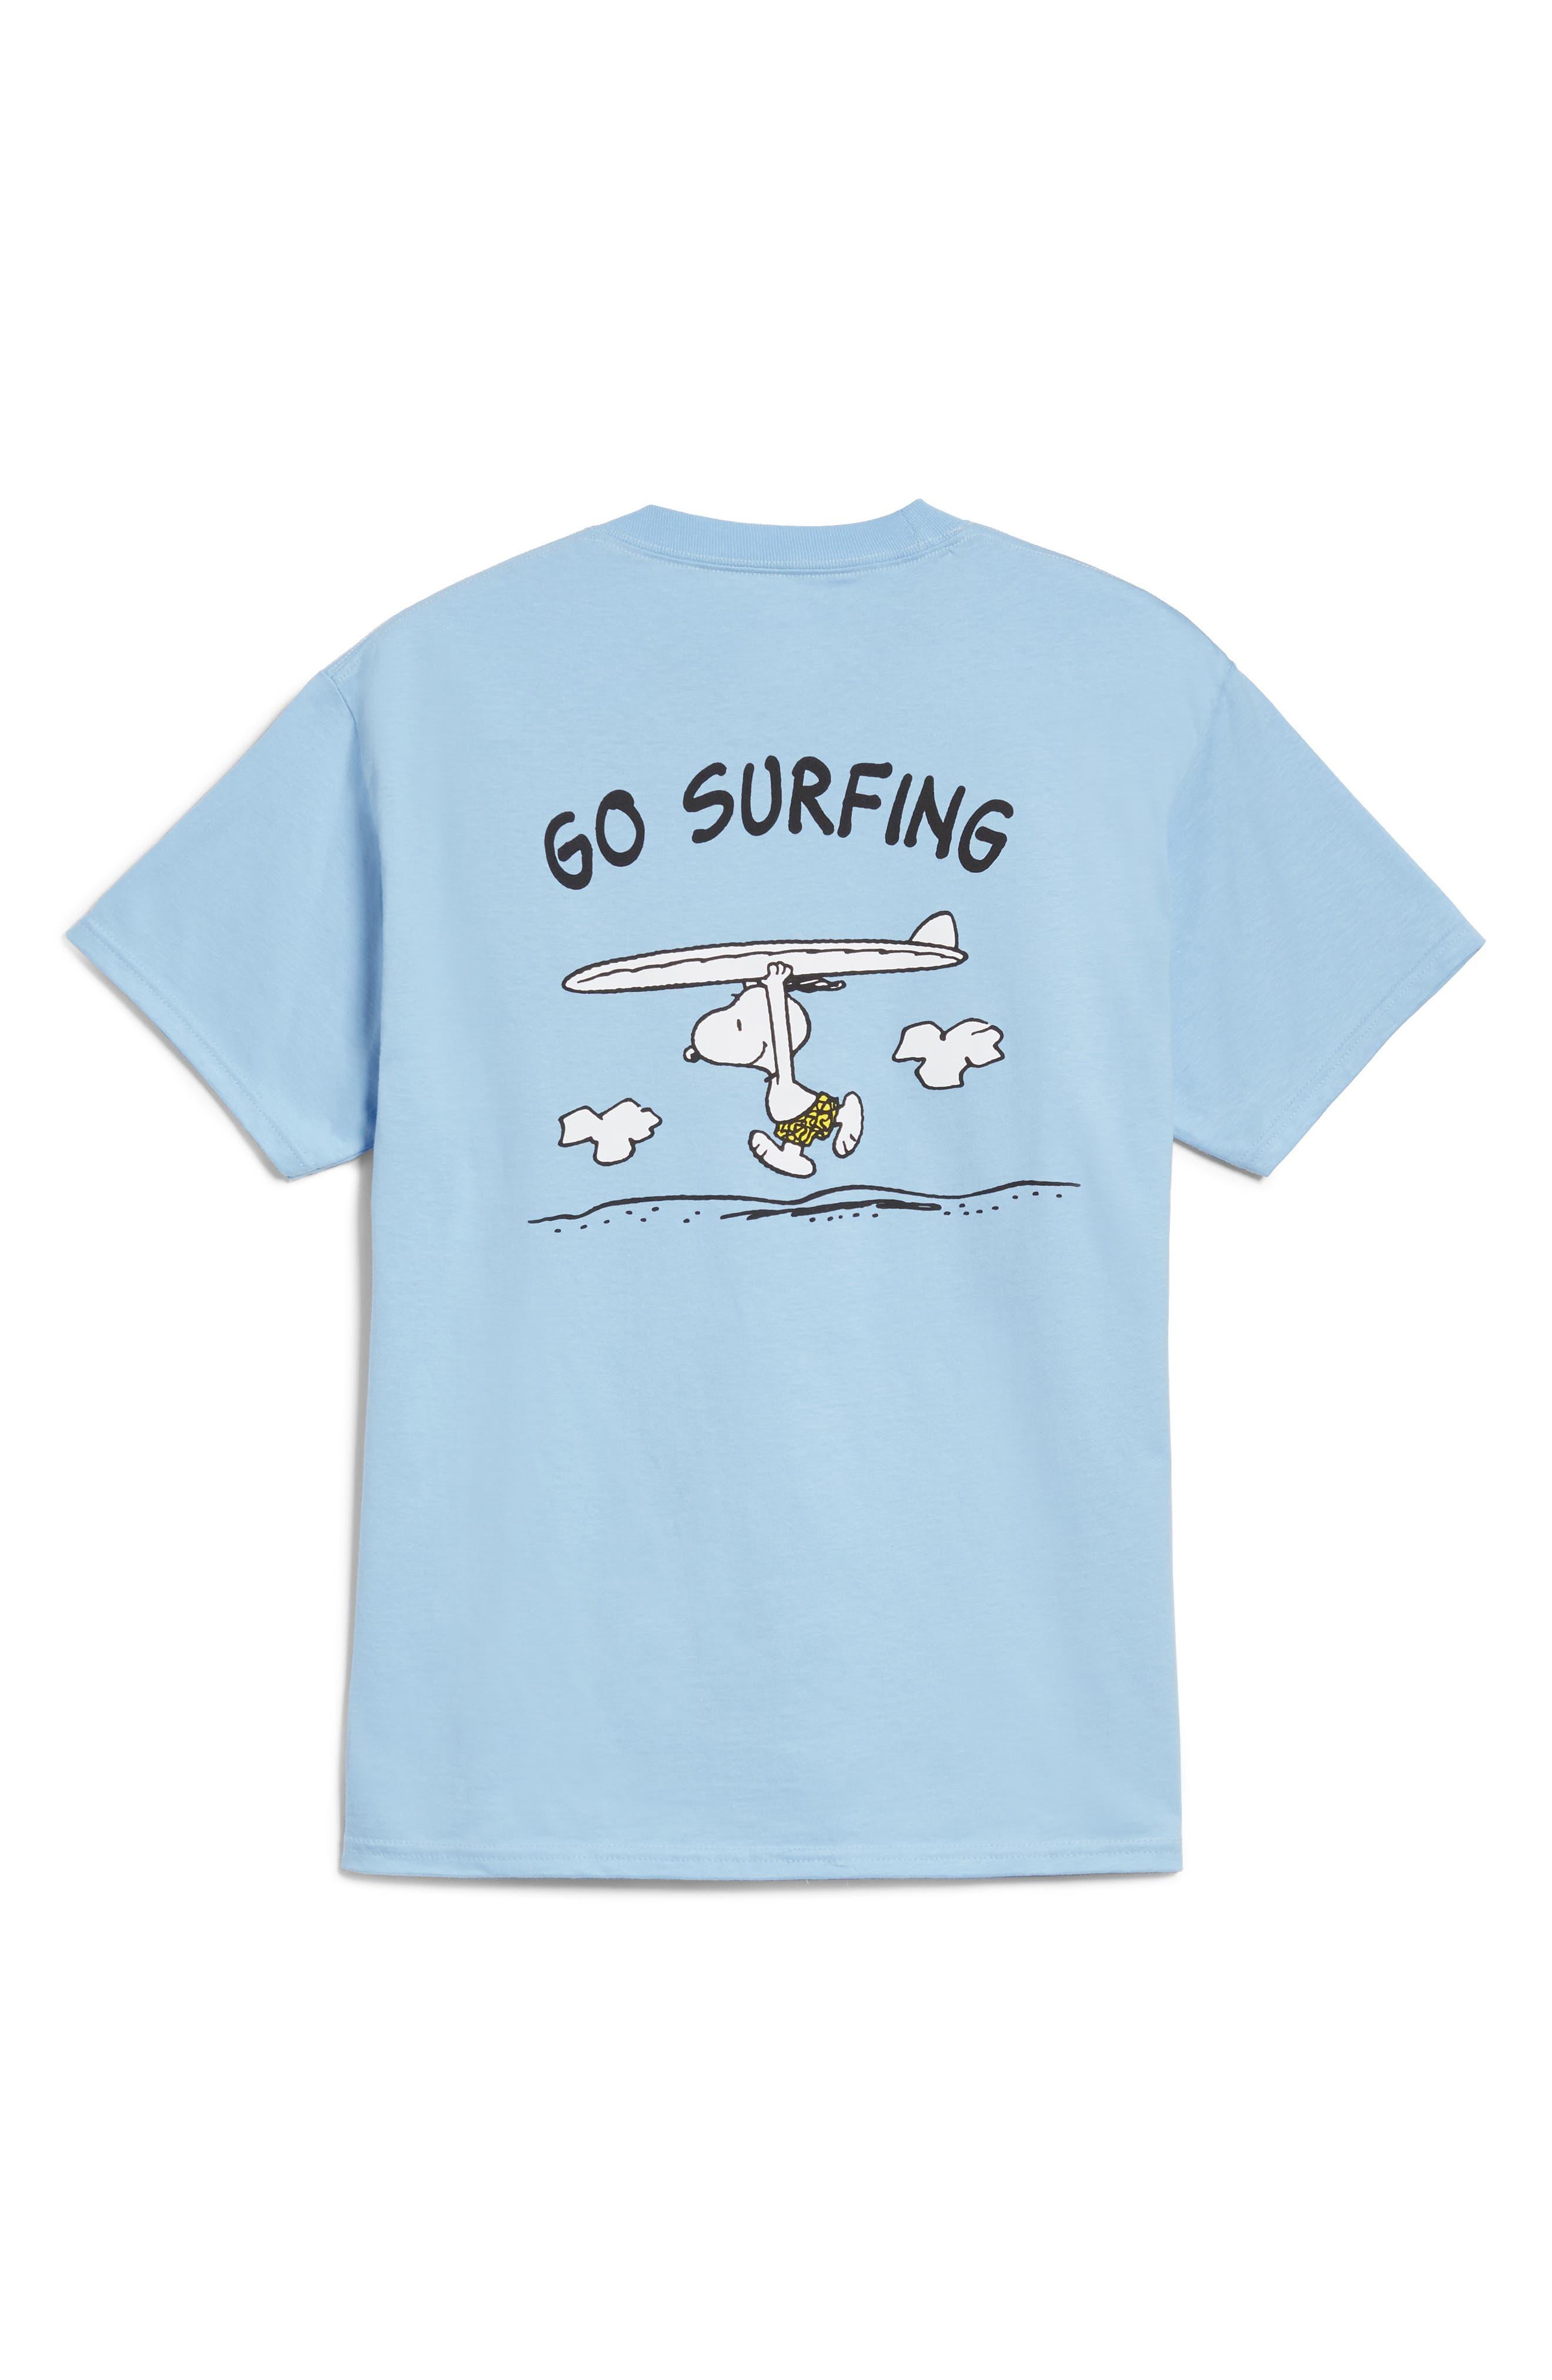 Peanuts Go Surfing T-Shirt